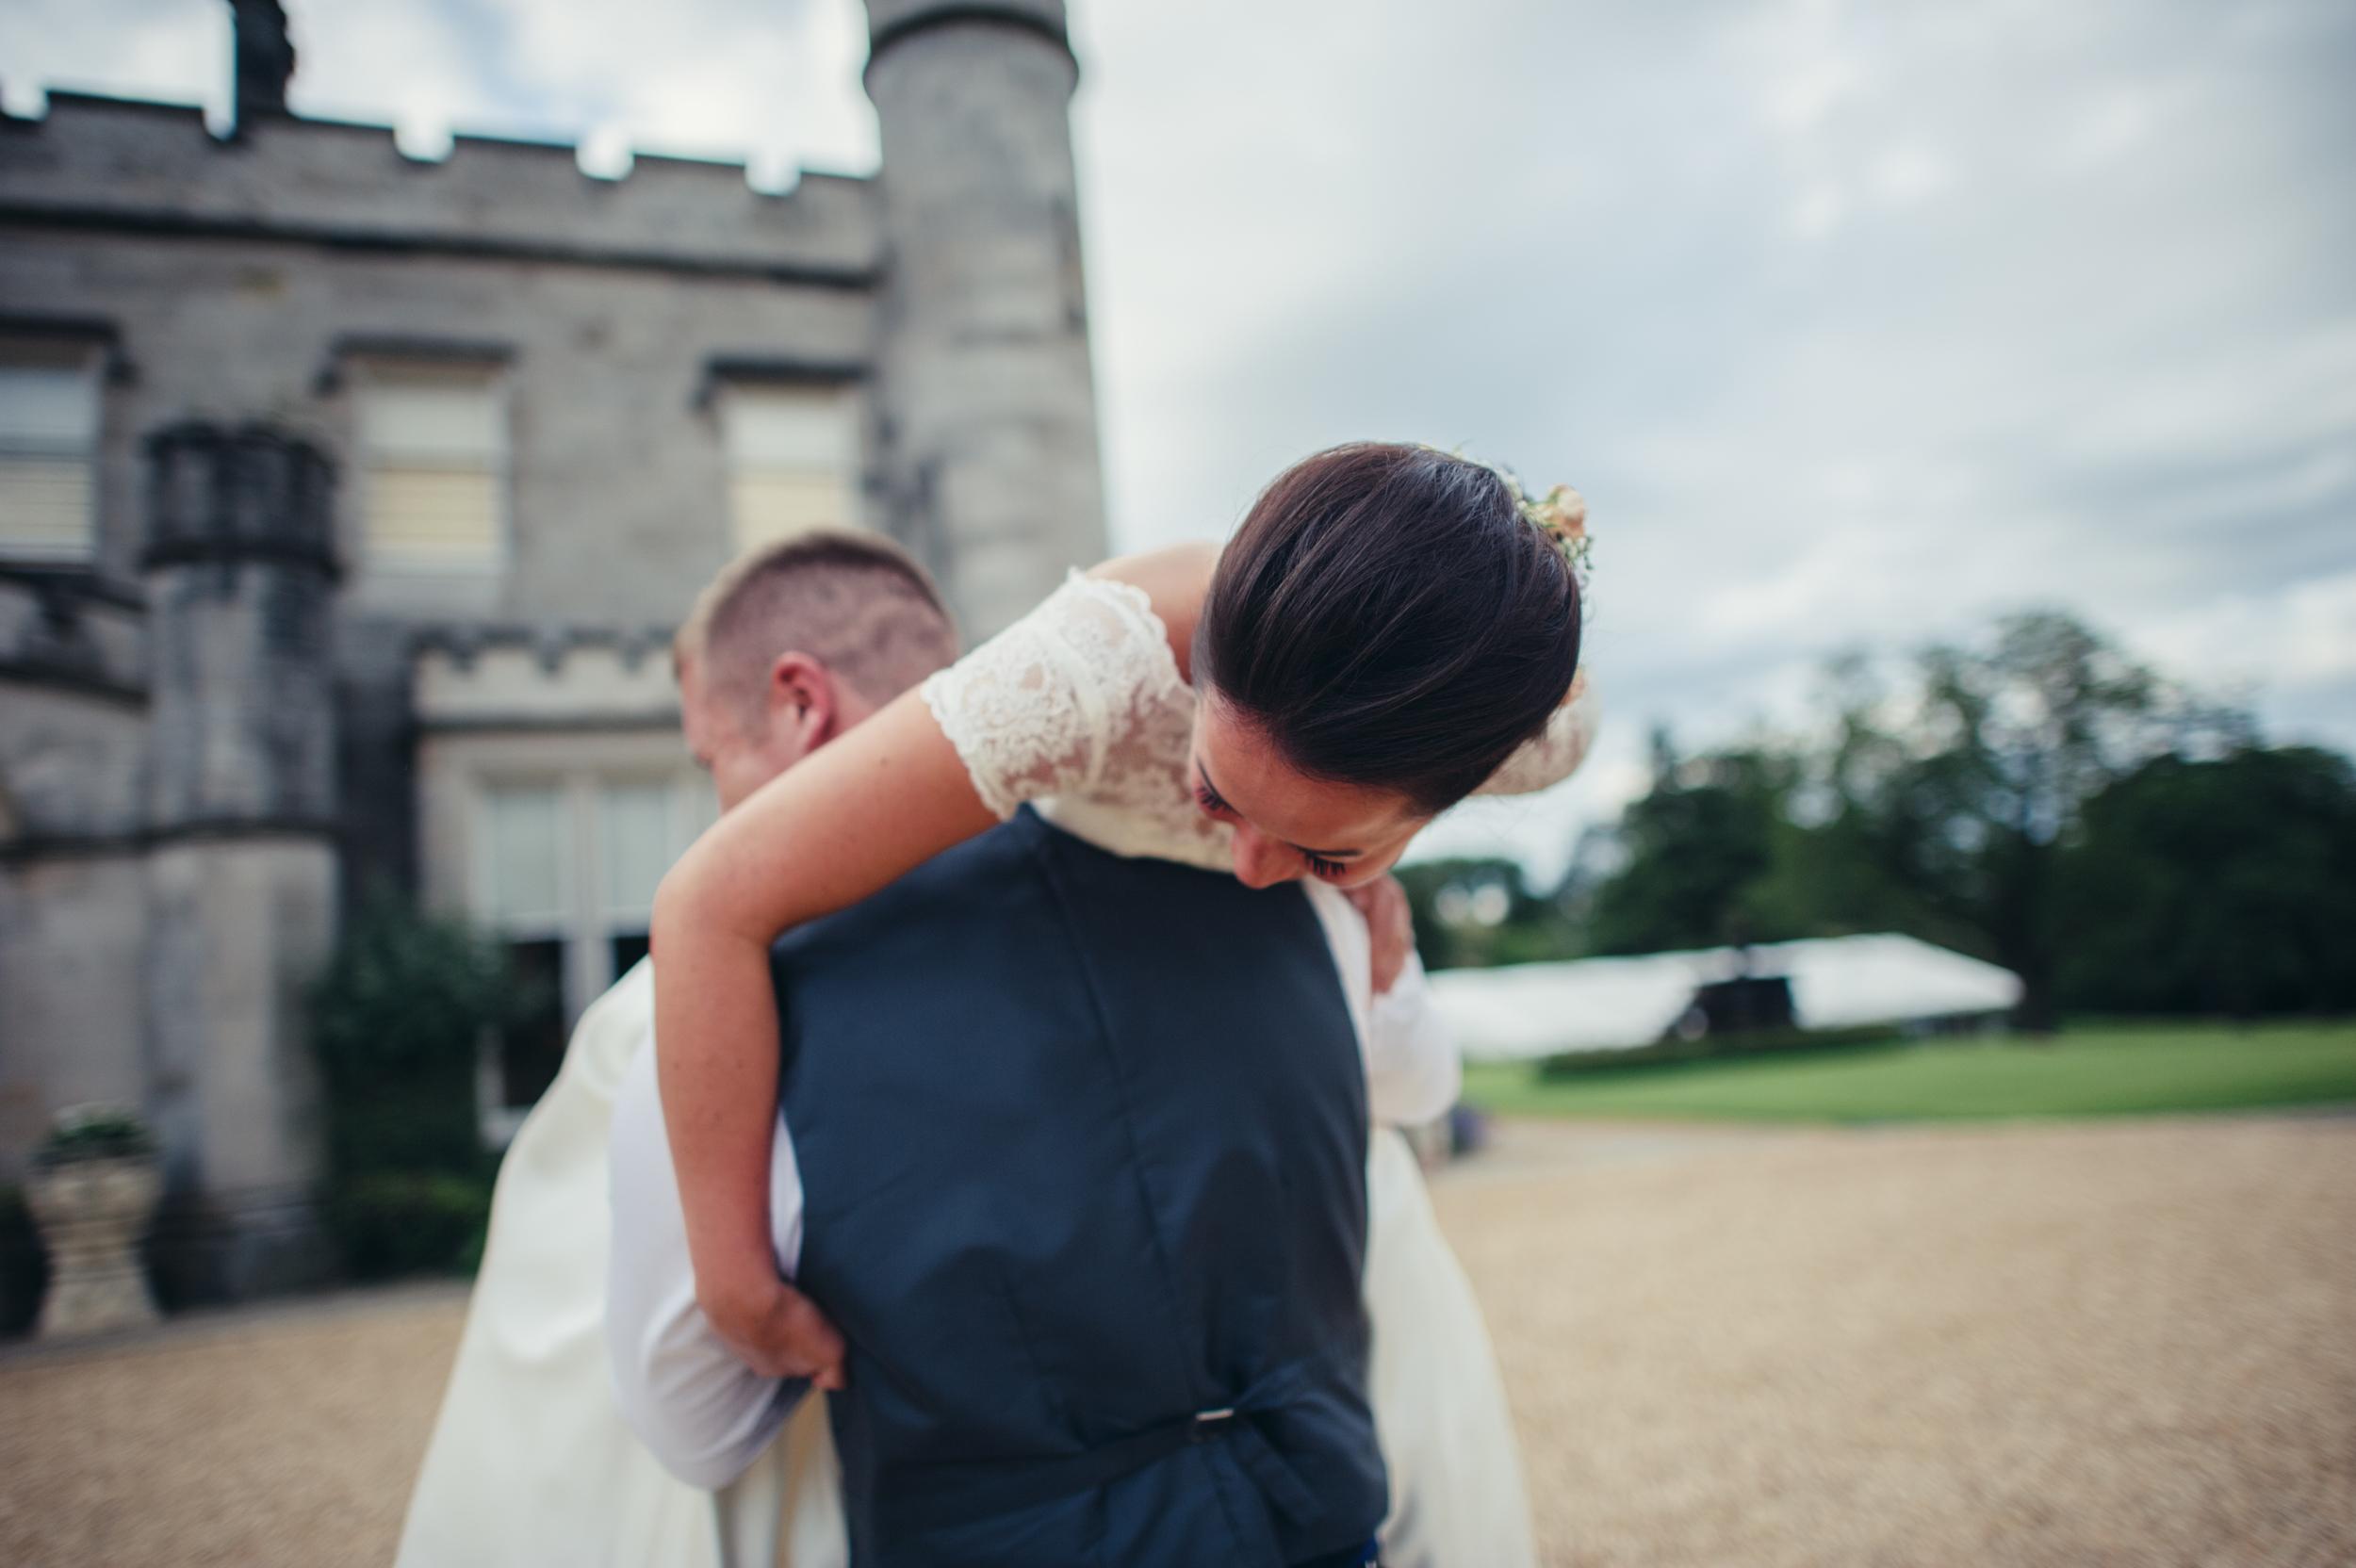 0178-lisa-devine-alternative-creative-wedding-photography-glasgow-edinburgh.JPG